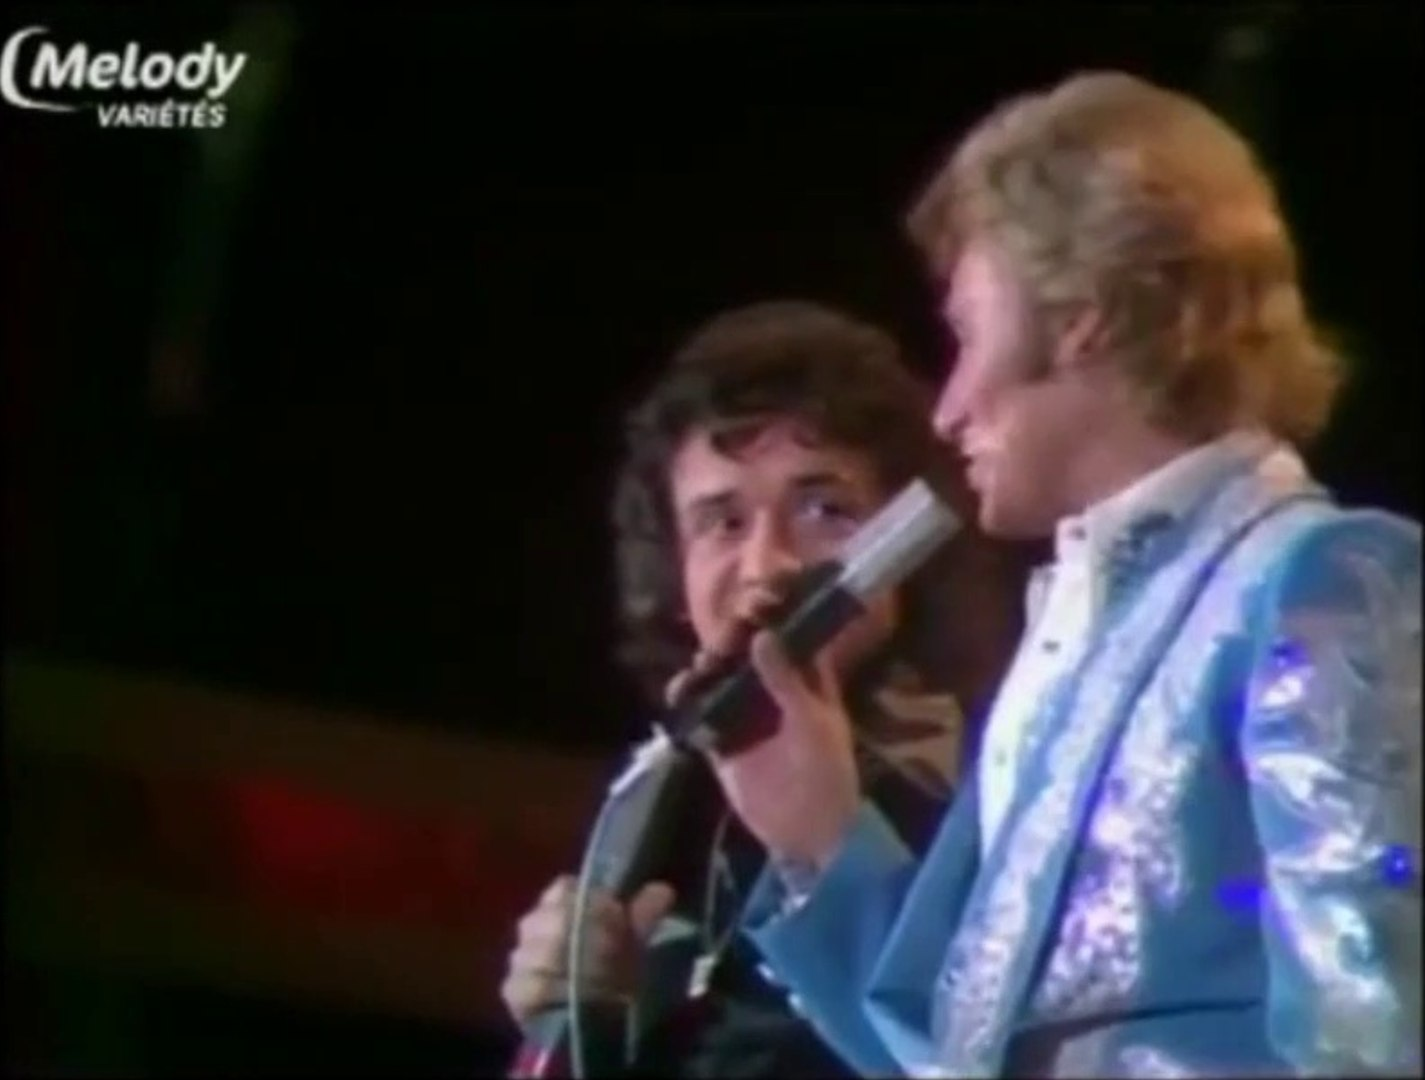 Johnny Hallyday et Michel Sardou - medley - 1974